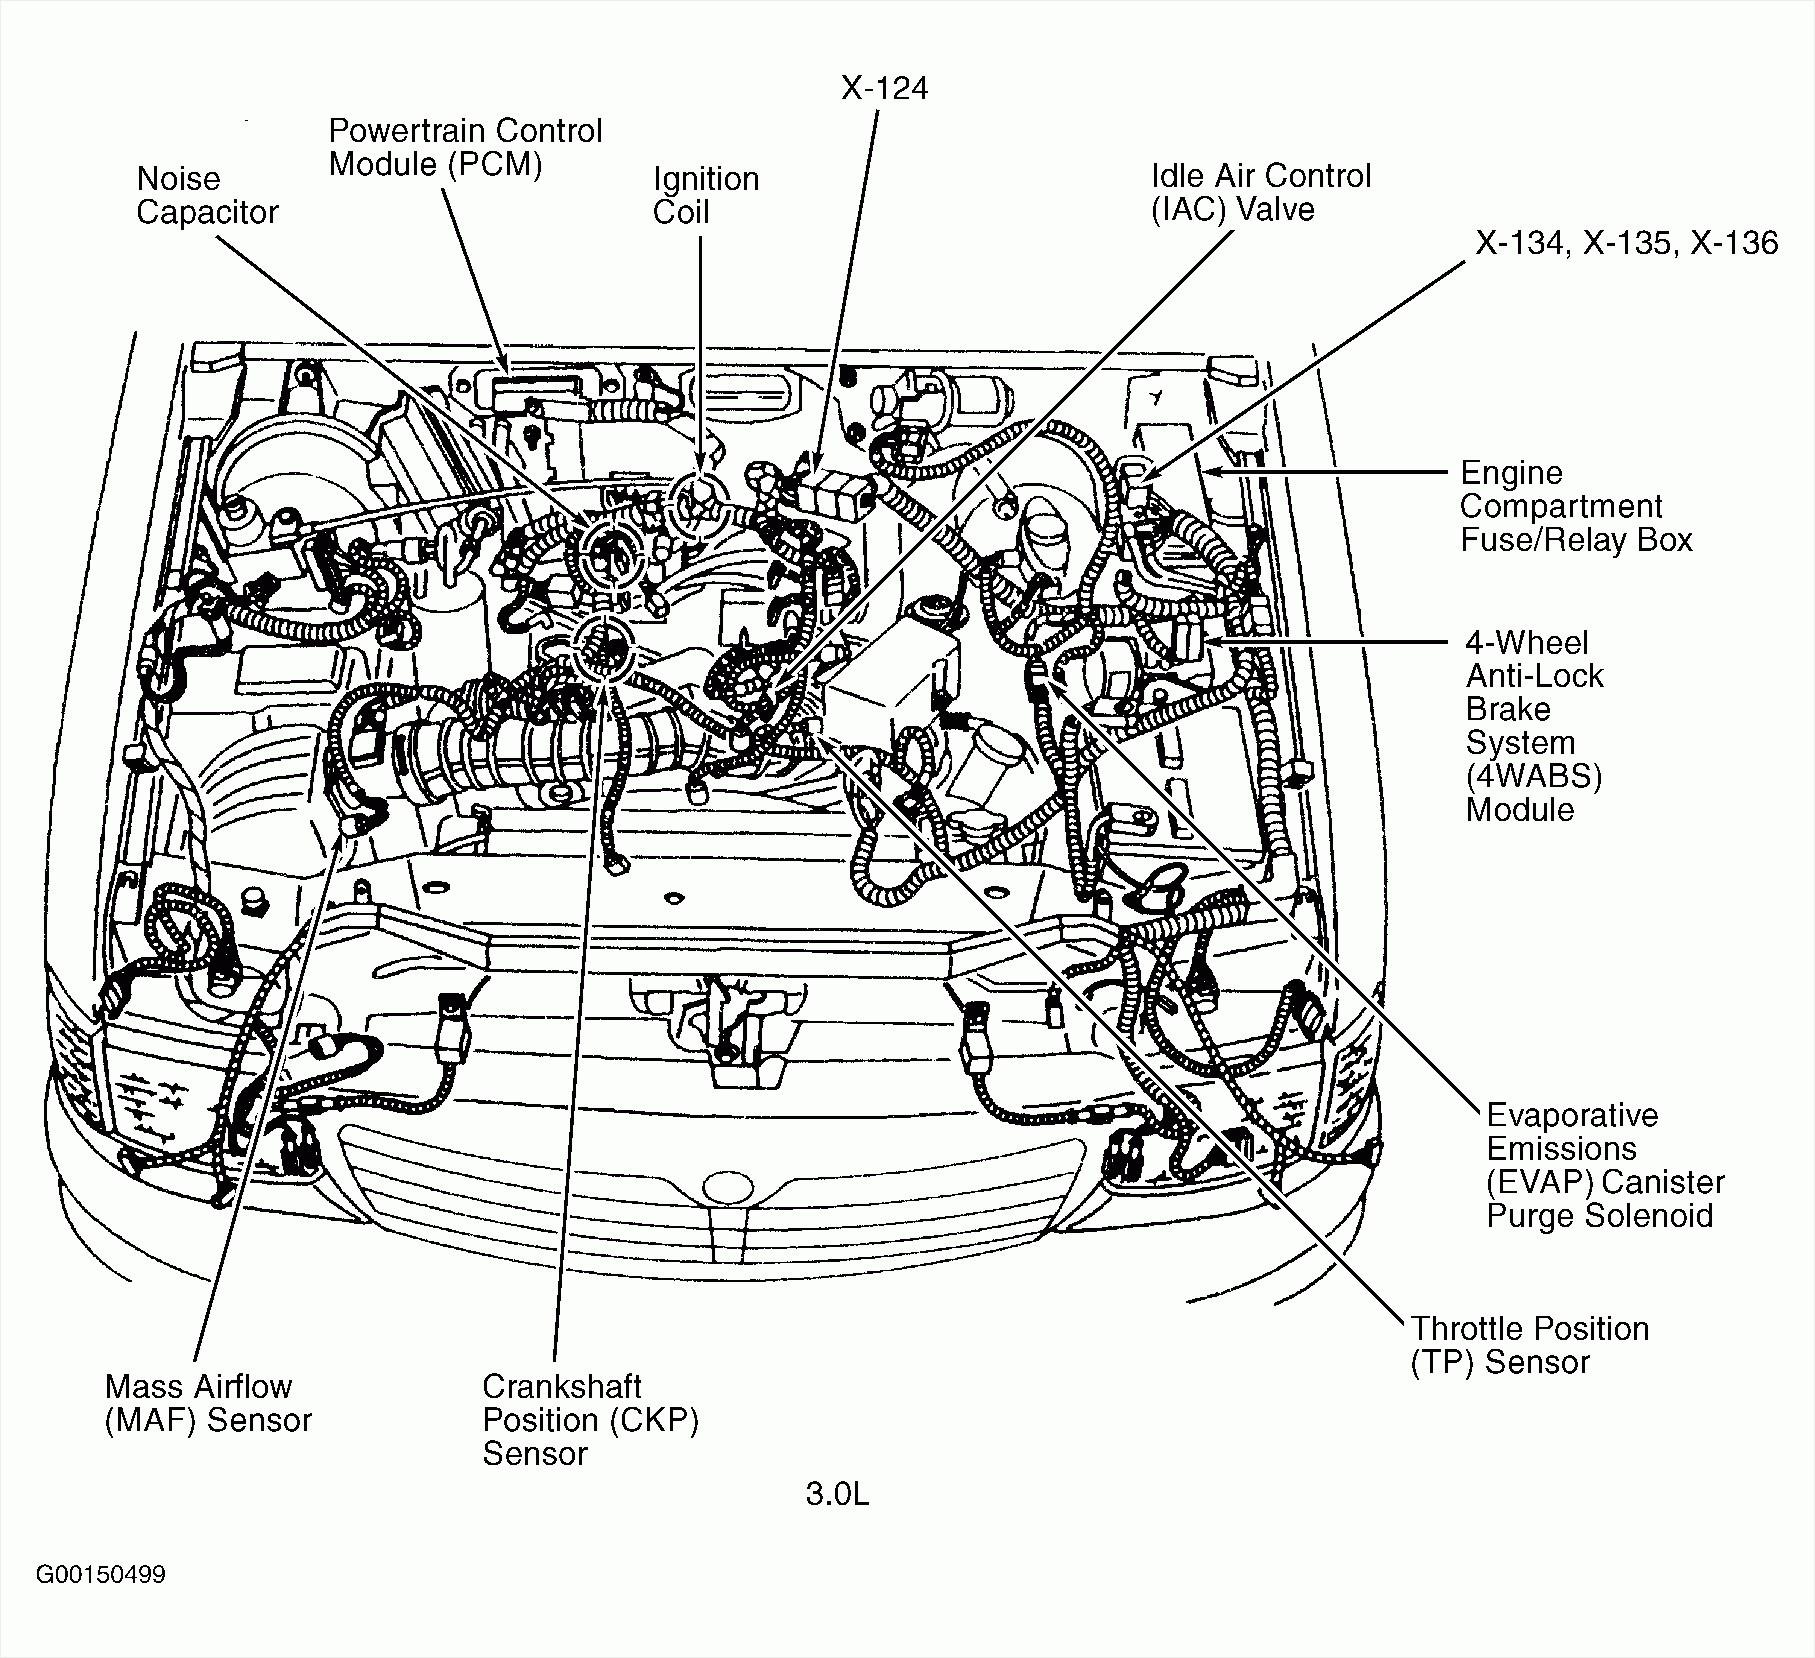 V6 Engine Diagram ford Ranger 3 0 V6 Engine Diagram ford Wiring Diagrams Instructions